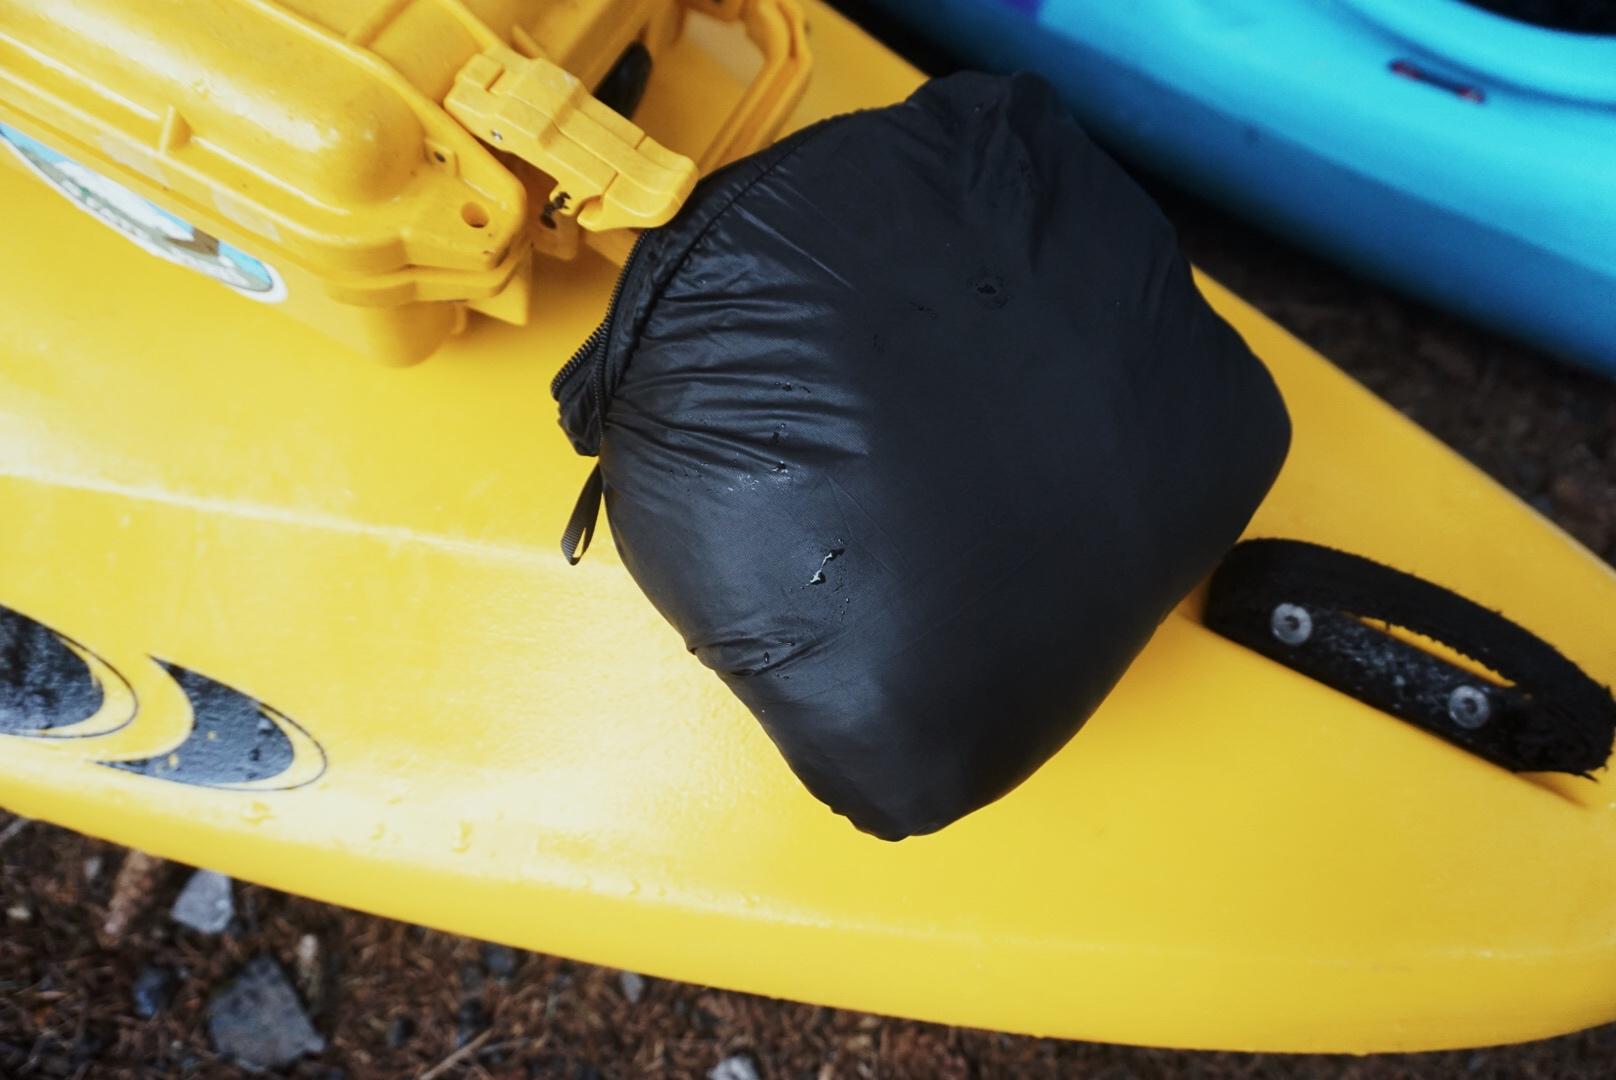 The Patagonia Nano Puff Jacket packs into its pocket.  Photo courtesy of Adam Edwards